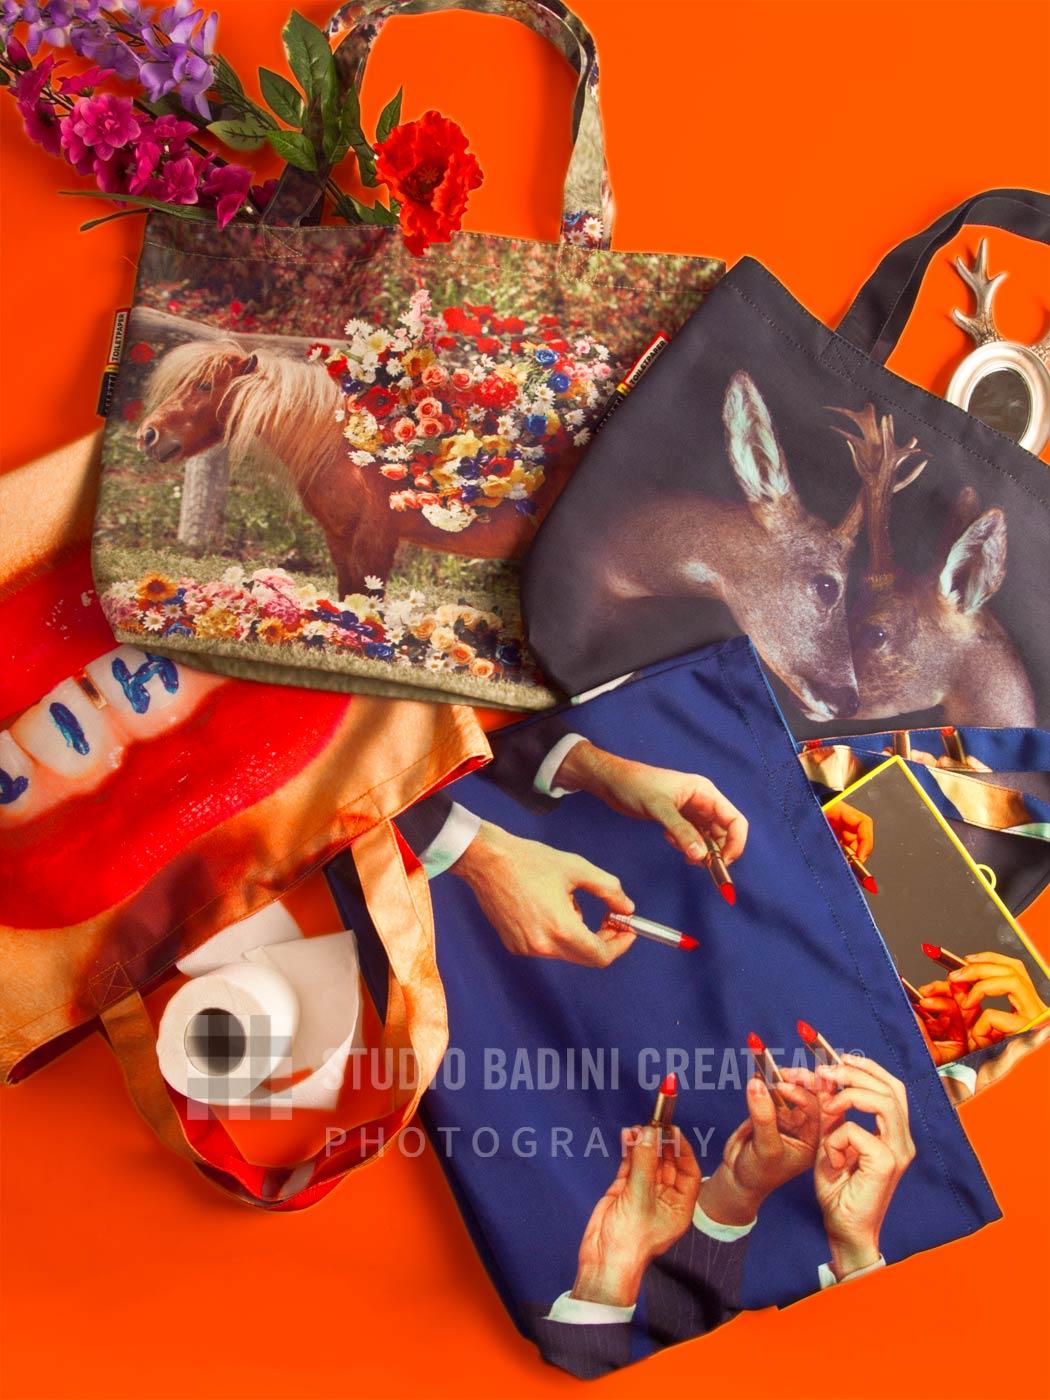 Badini Creative Studio - fotografia - toiletpaper - bags